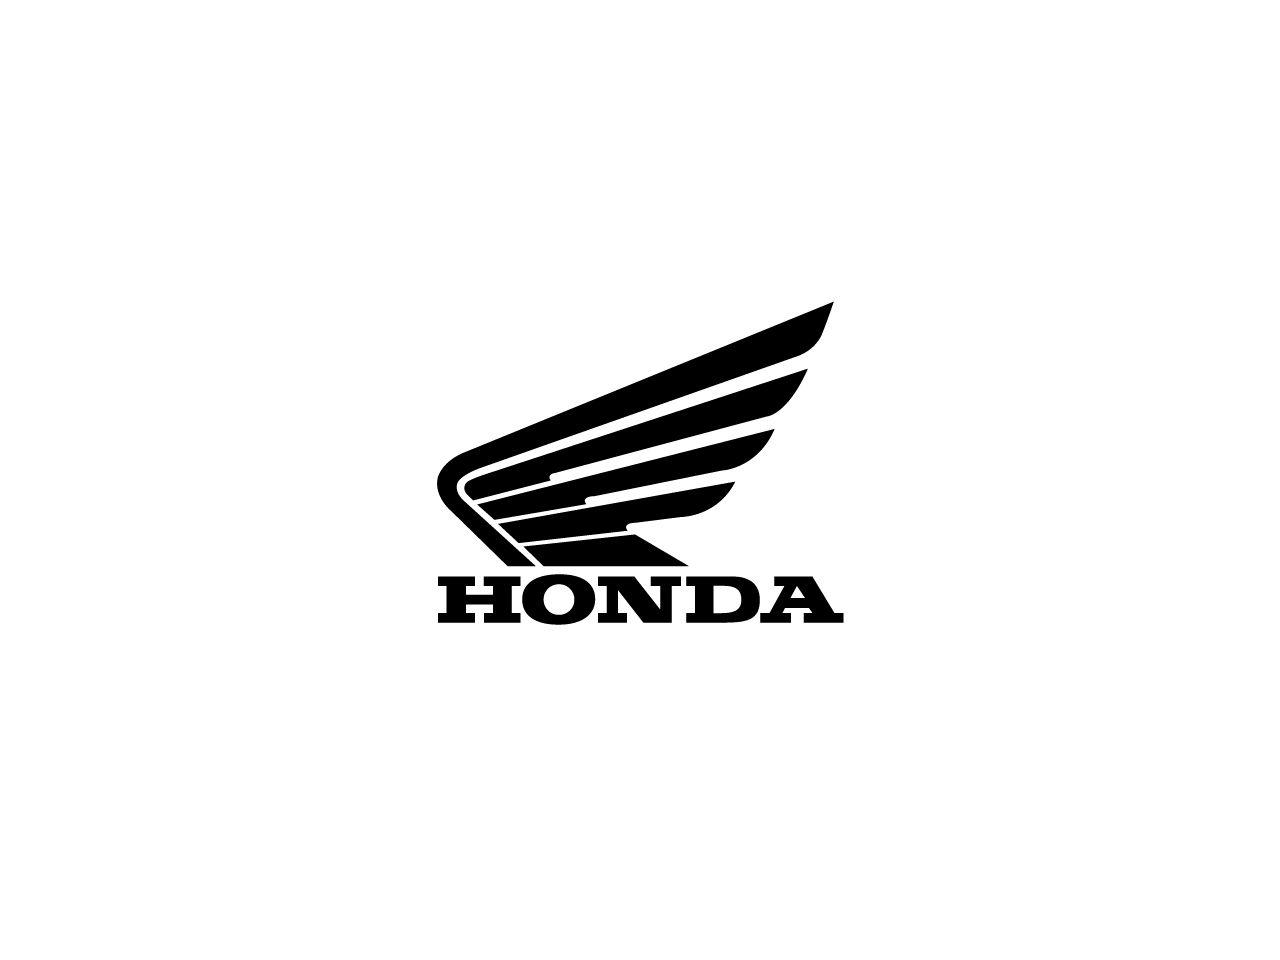 honda motorcycle logo wallpaper widescreen 2 hd wallpapers rh pinterest co uk honda motorcycle logo vector honda motorcycle logo vintage